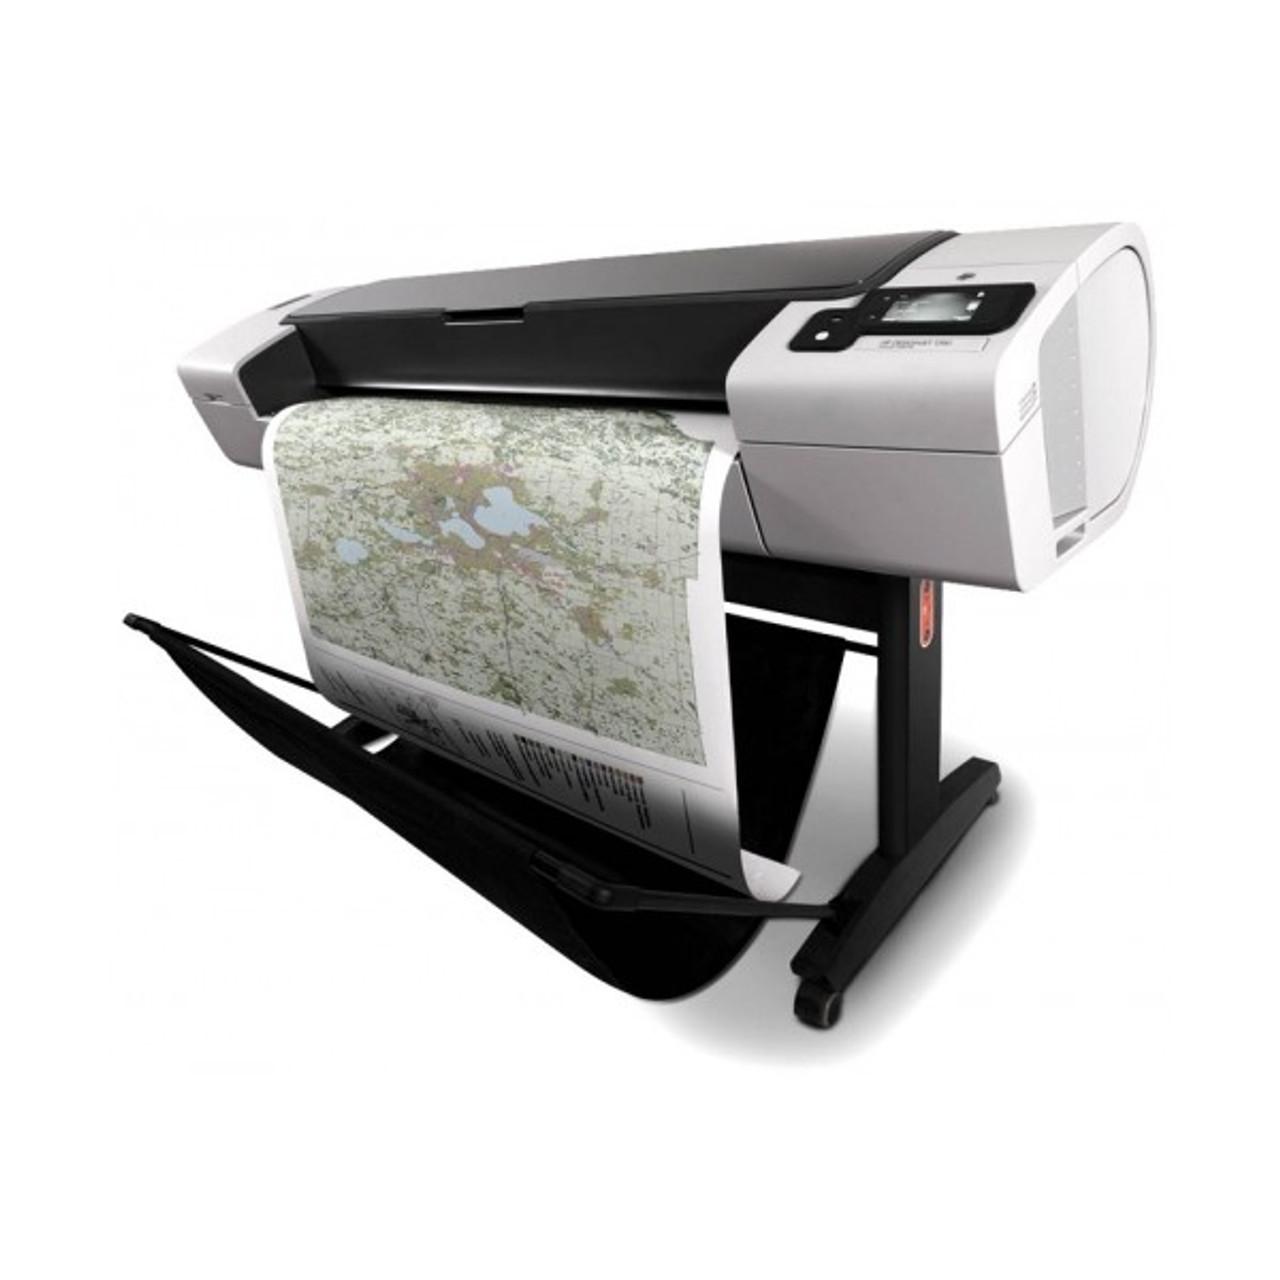 HP Designjet T770 44-inch plotter